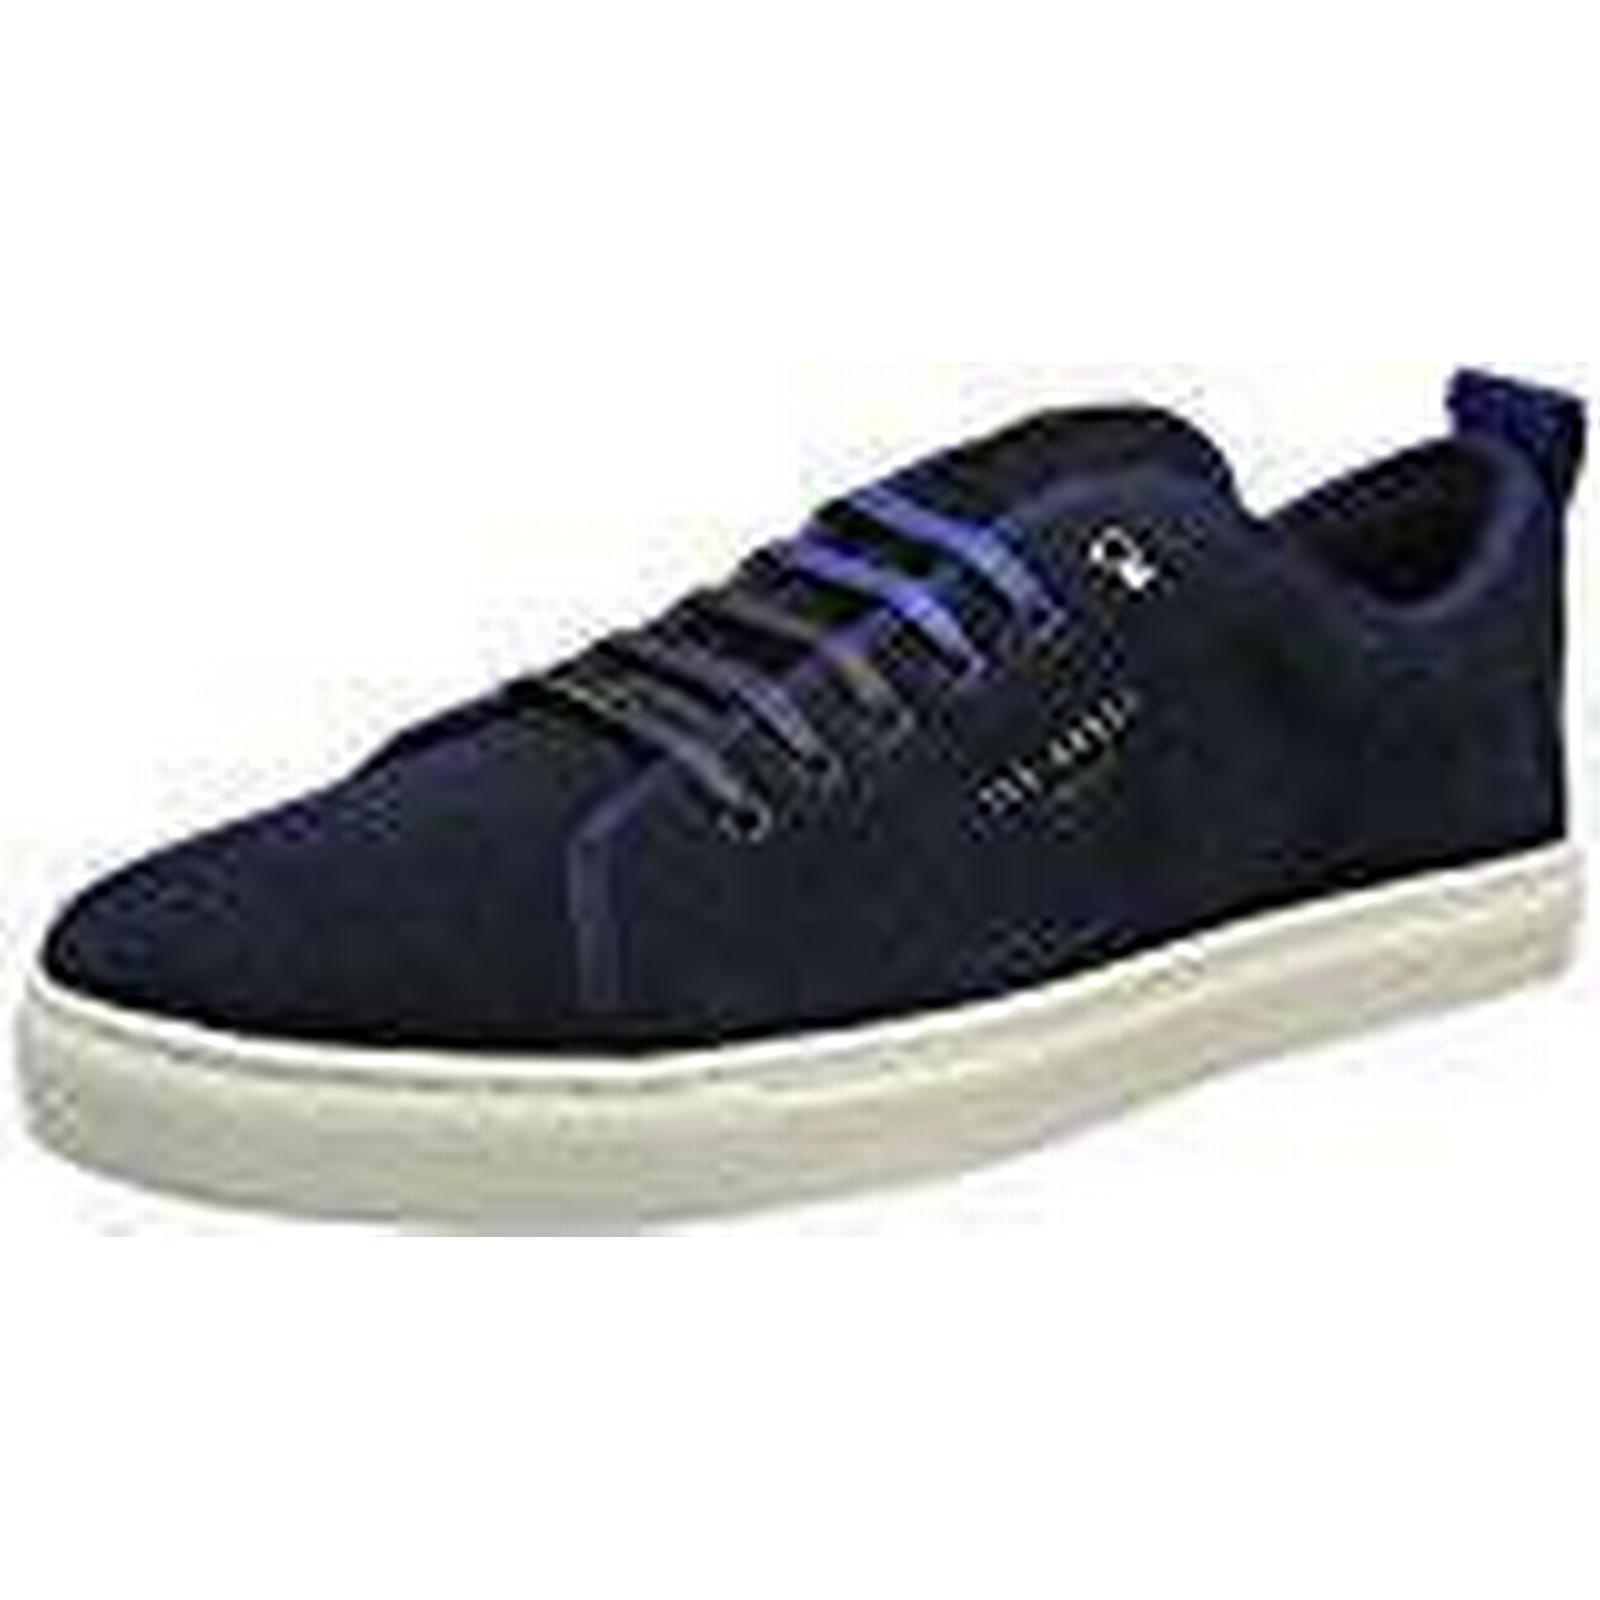 Ted Baker Men's Kaliix Trainers, 10 Blue (Dark Blue #0000ff), 10 Trainers, UK 44 EU d0ec73